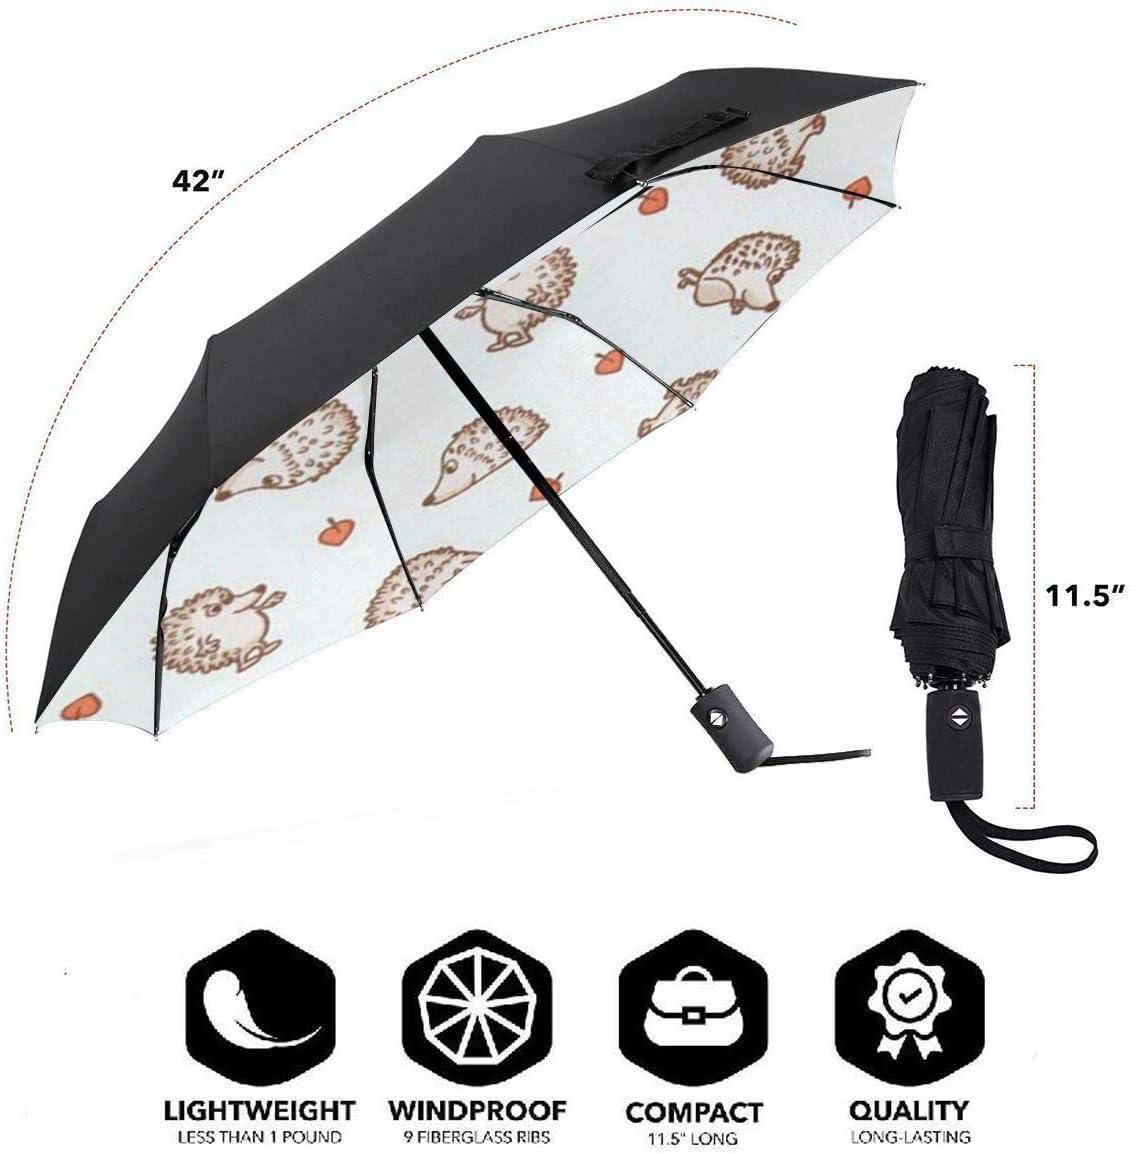 Hedgehog Leave Automatic Tri-Fold Umbrella Parasol Sun Umbrella Sunshade